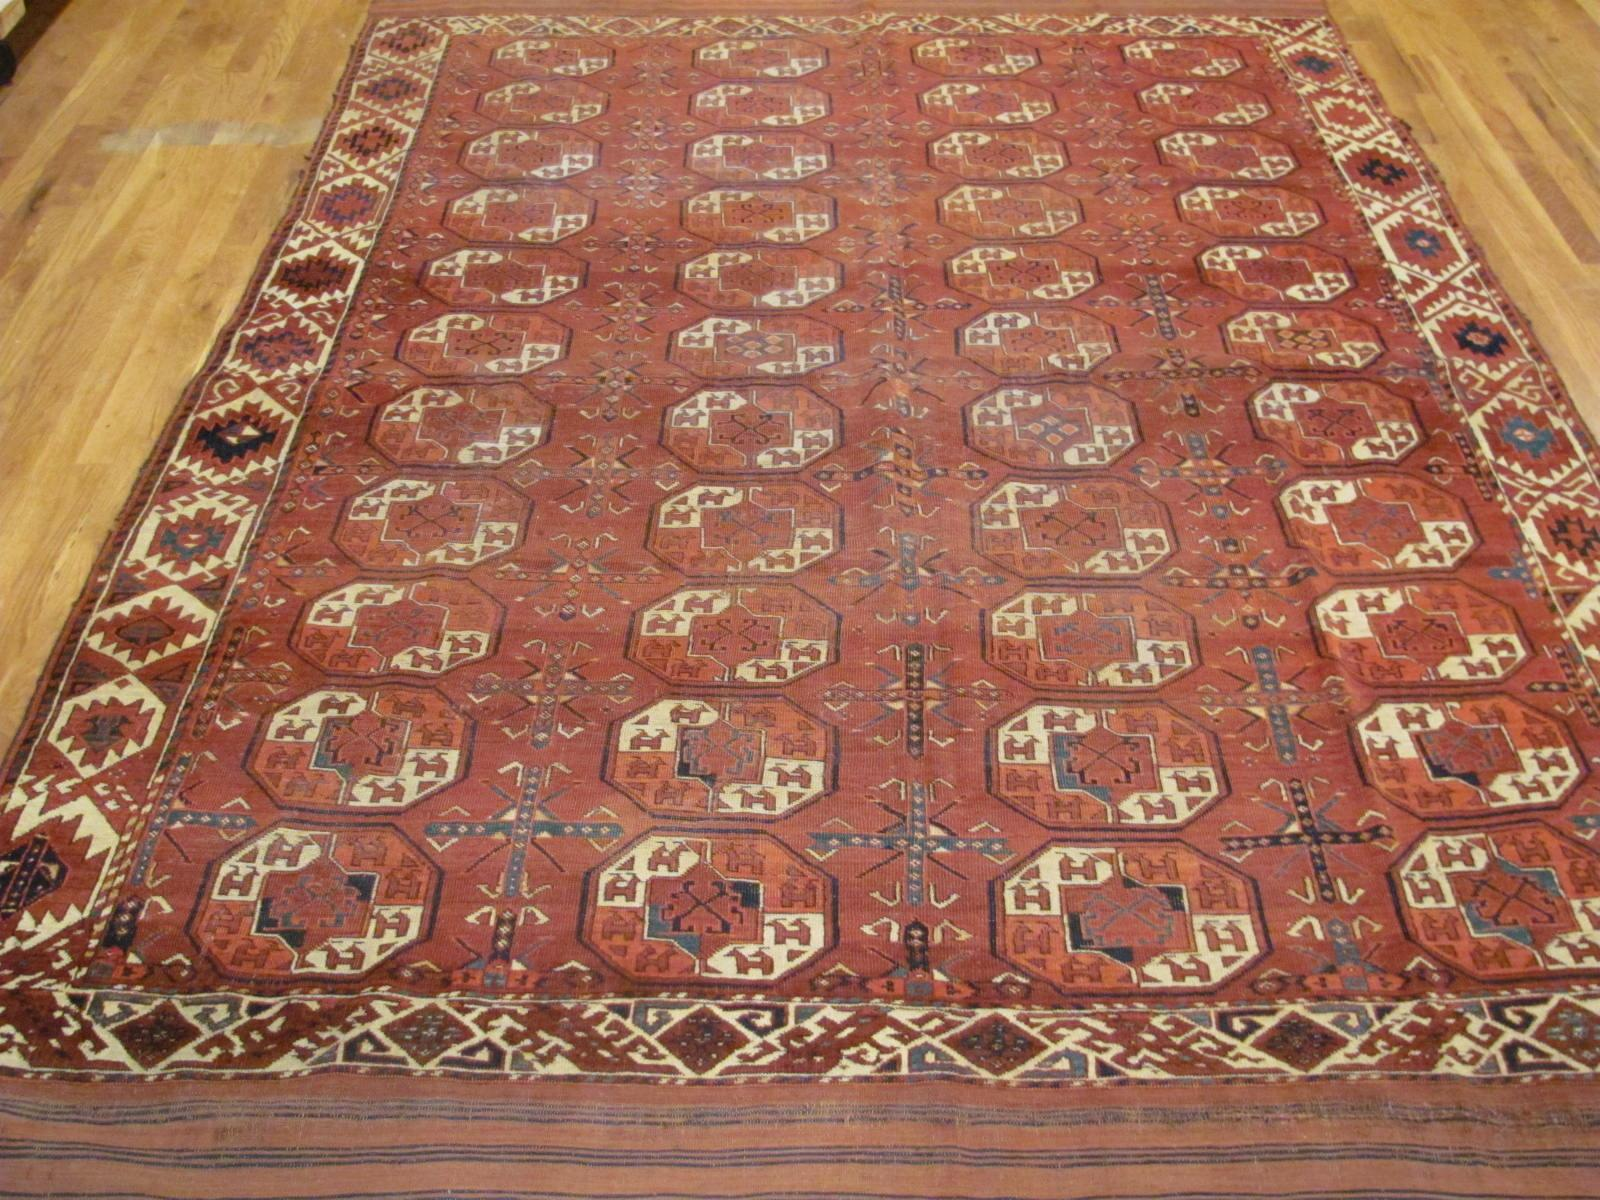 bukhara carpets prices carpet ideas. Black Bedroom Furniture Sets. Home Design Ideas